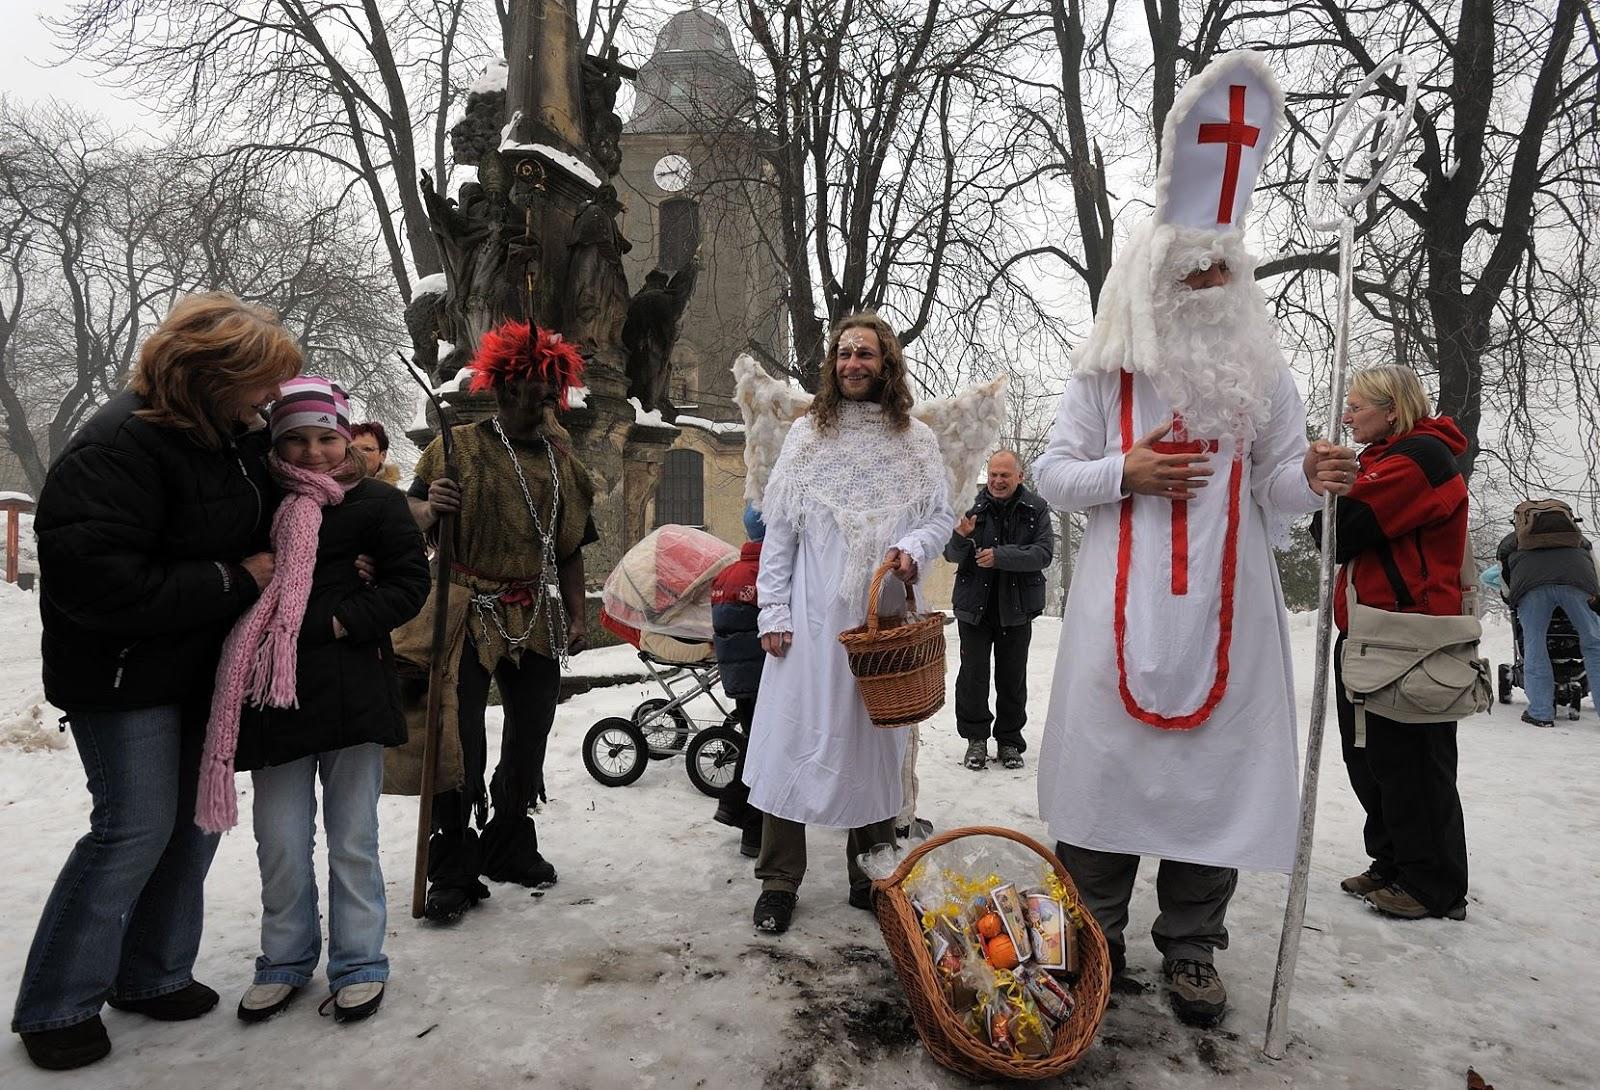 Advent na Krásné 30. 11. 2008 - mikulášská nadílka